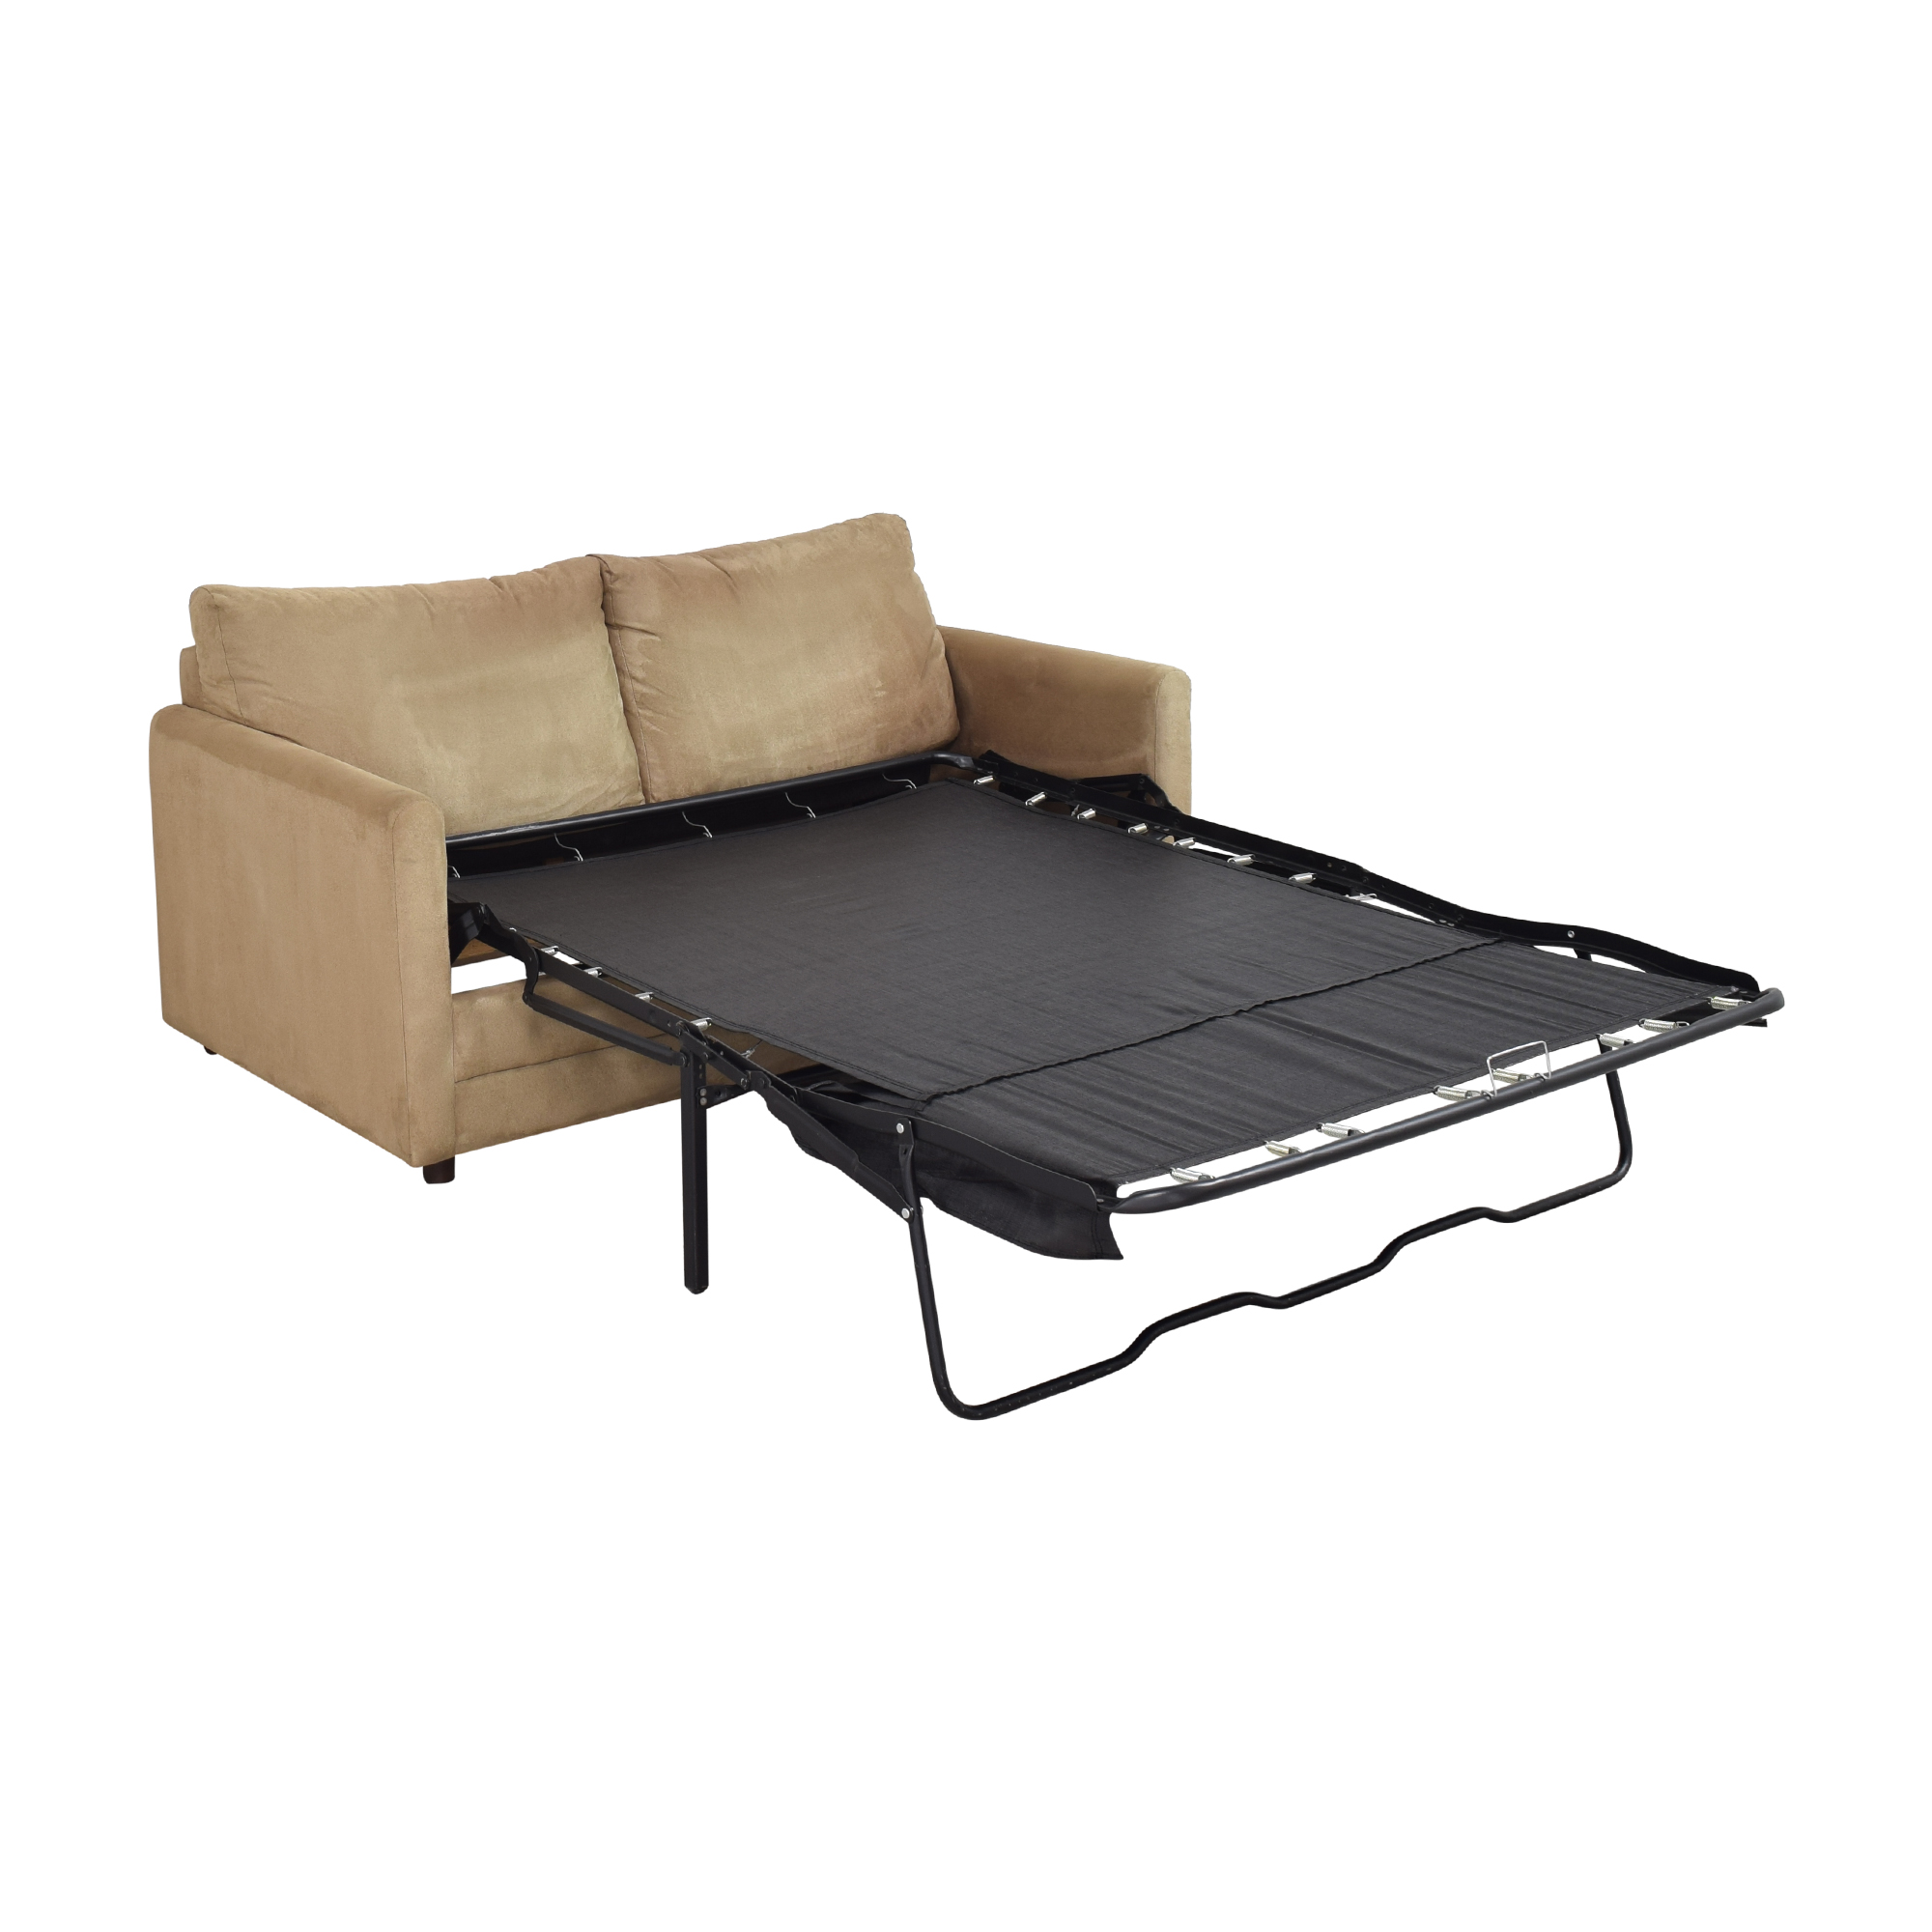 LaCrosse Furniture Lacrosse Furniture Two Cushion Sleeper Loveseat used